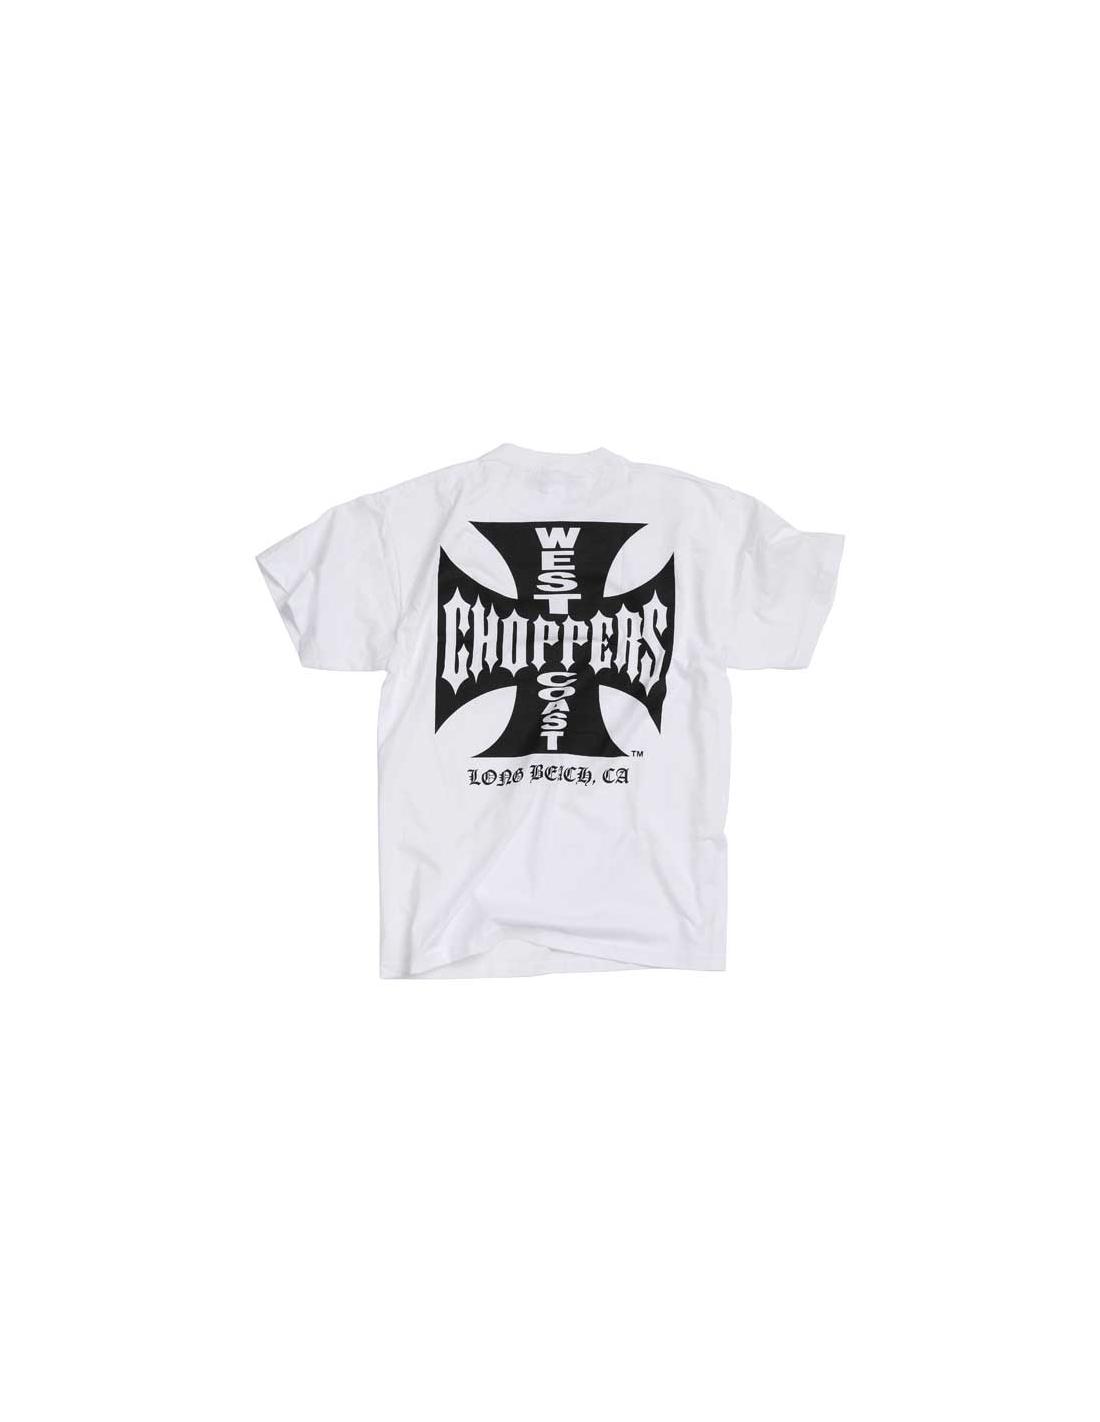 West Coast Choppers T-Shirt - Original Cross White Black